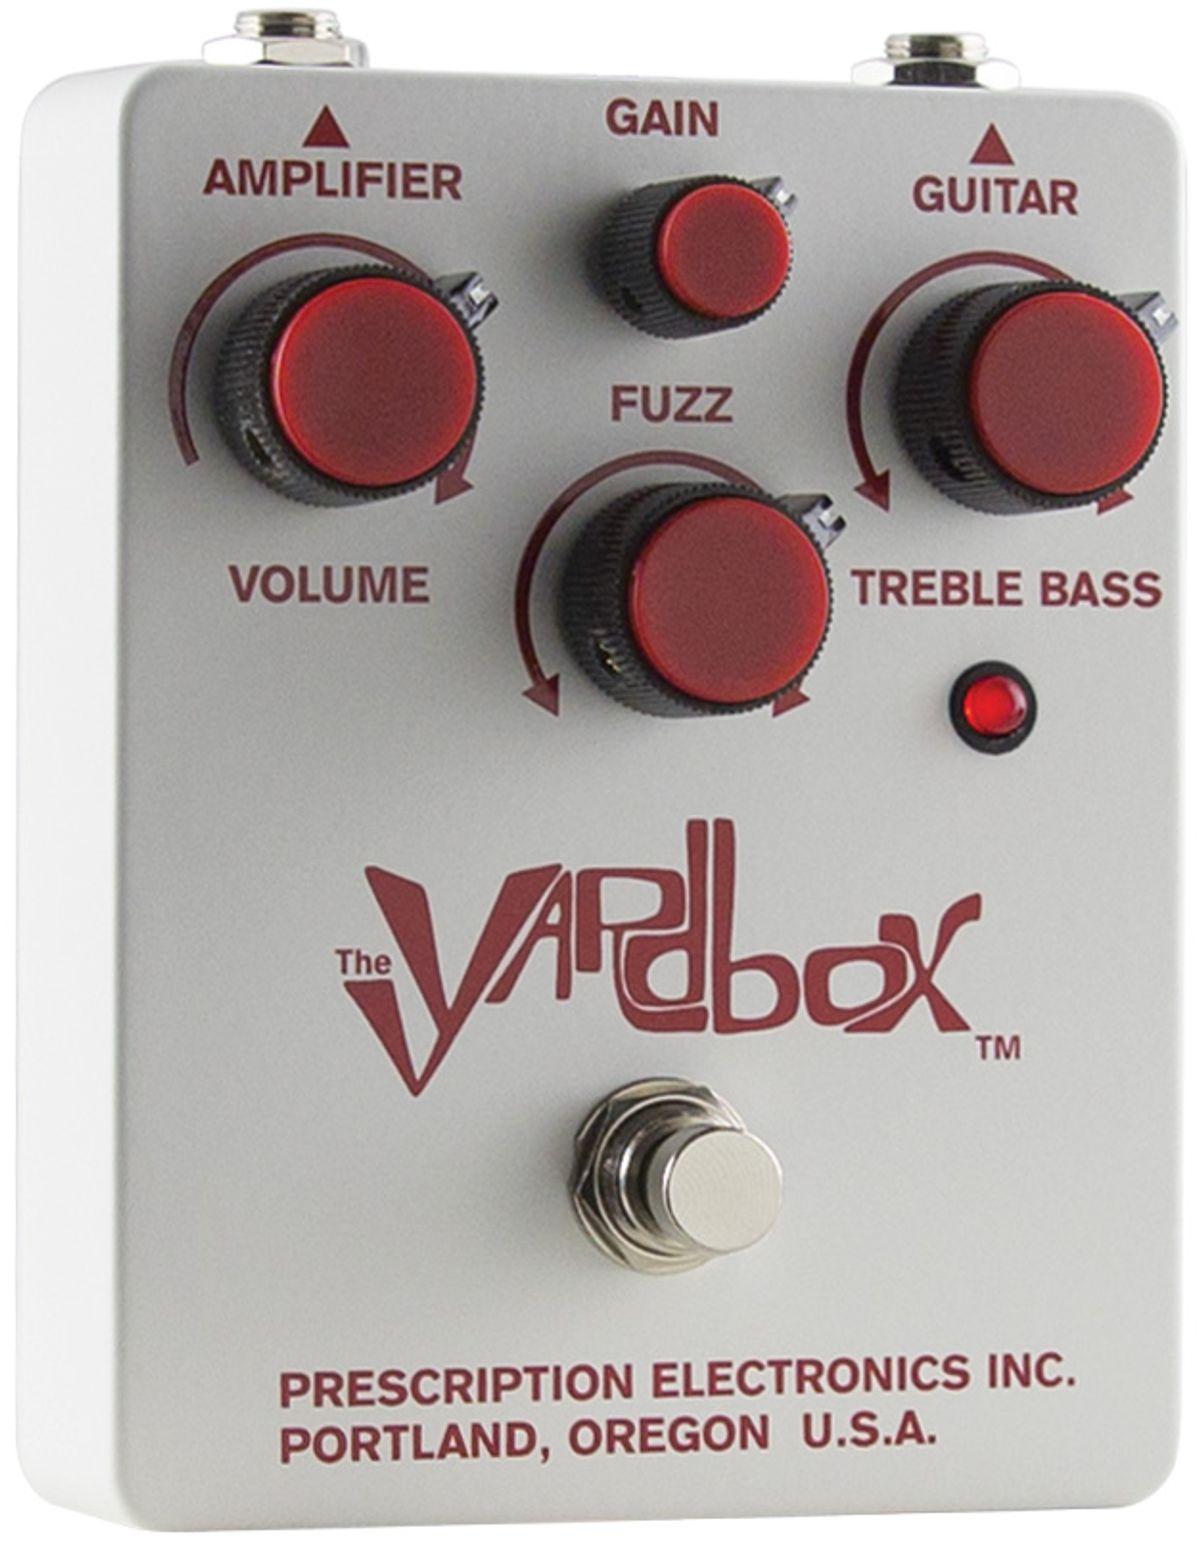 Prescription Electronics Yardbox Review